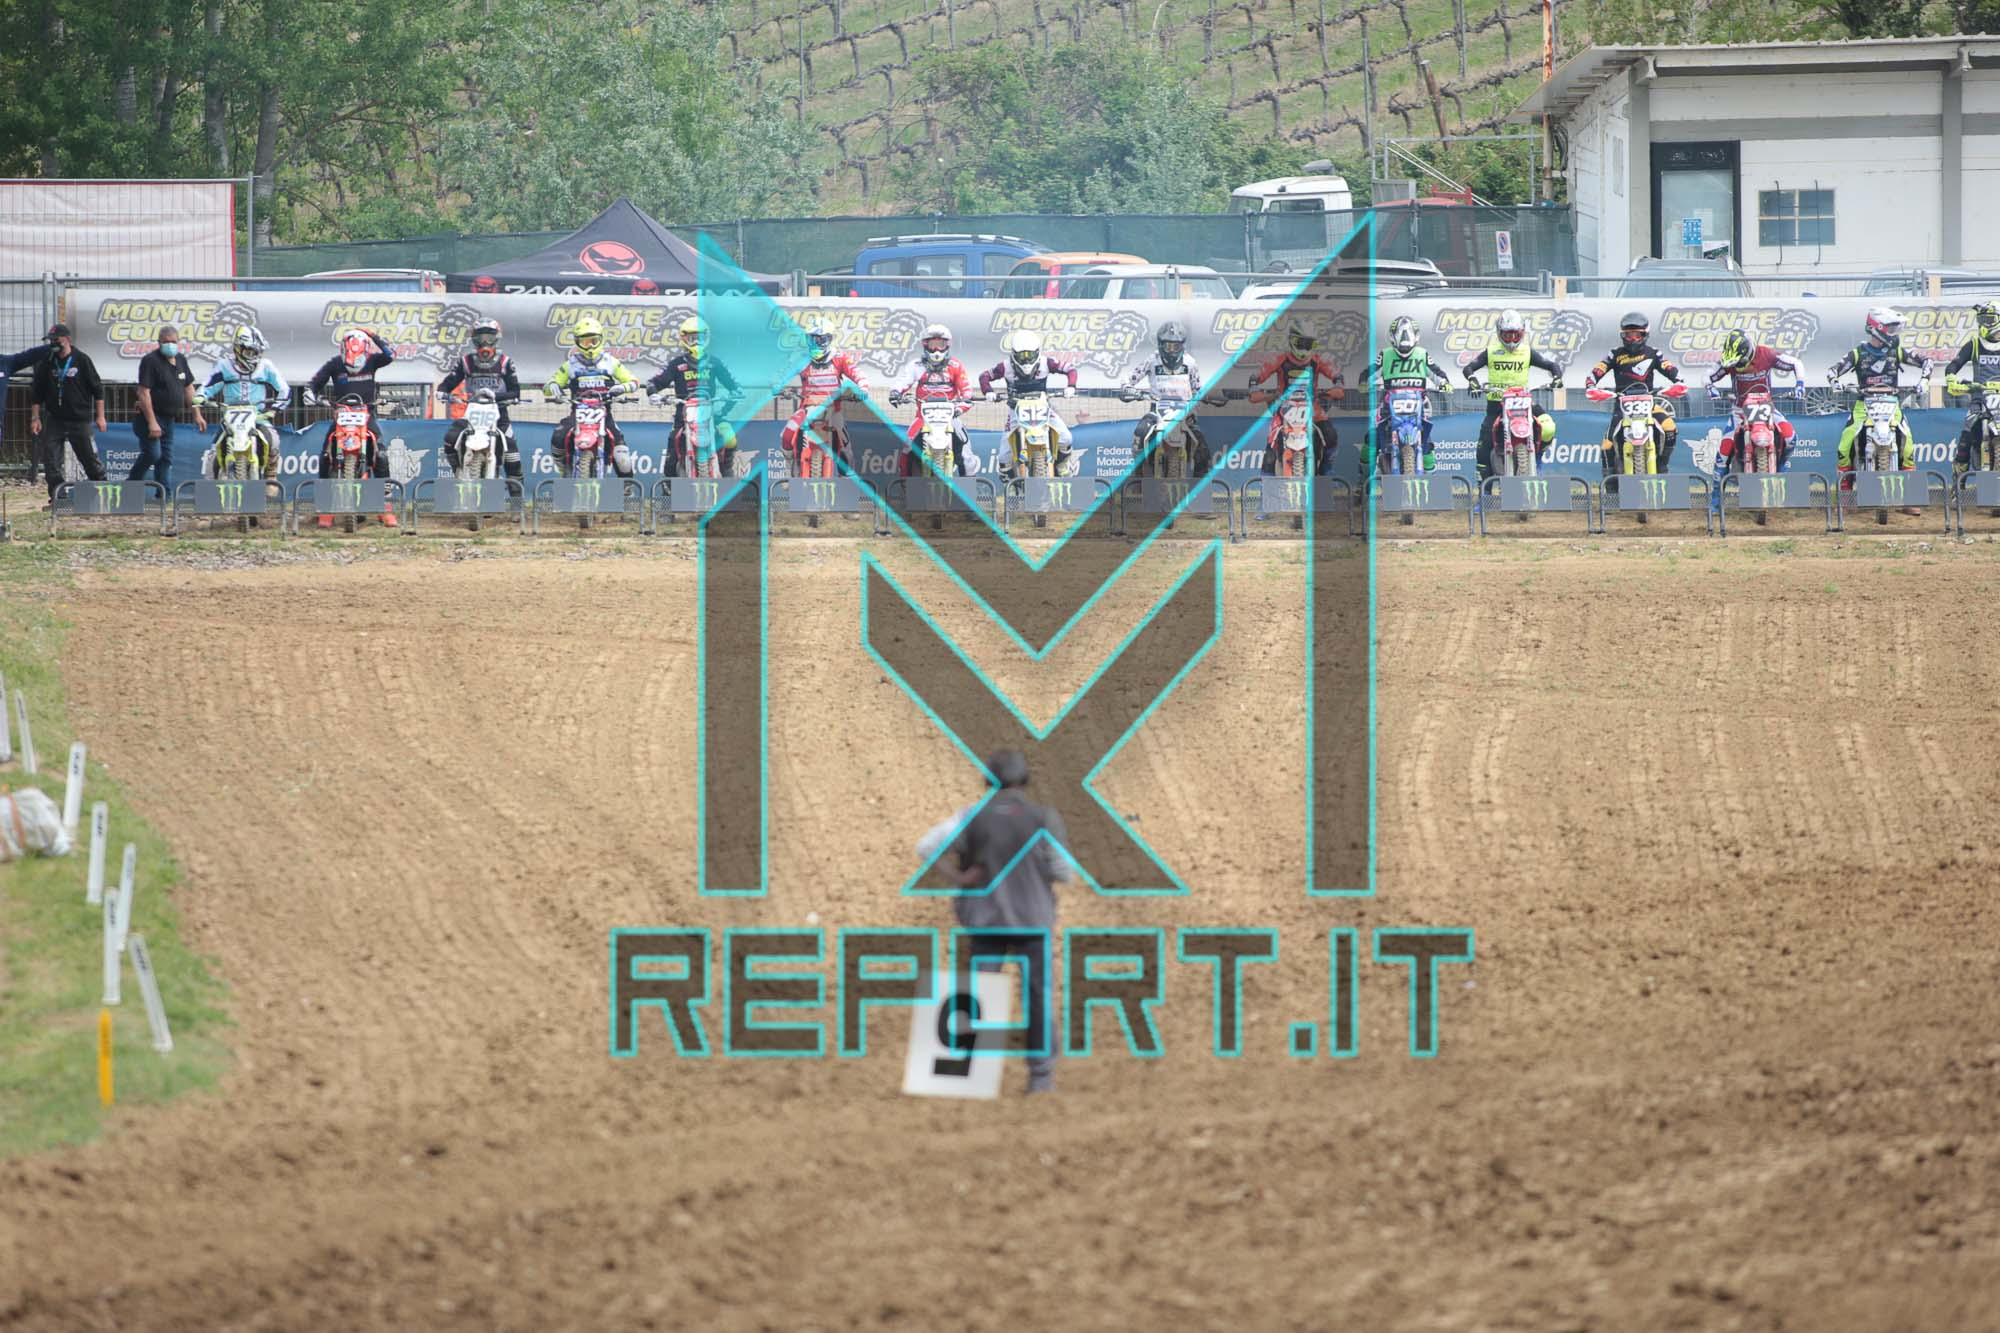 FaenzaFmi-010521-1010